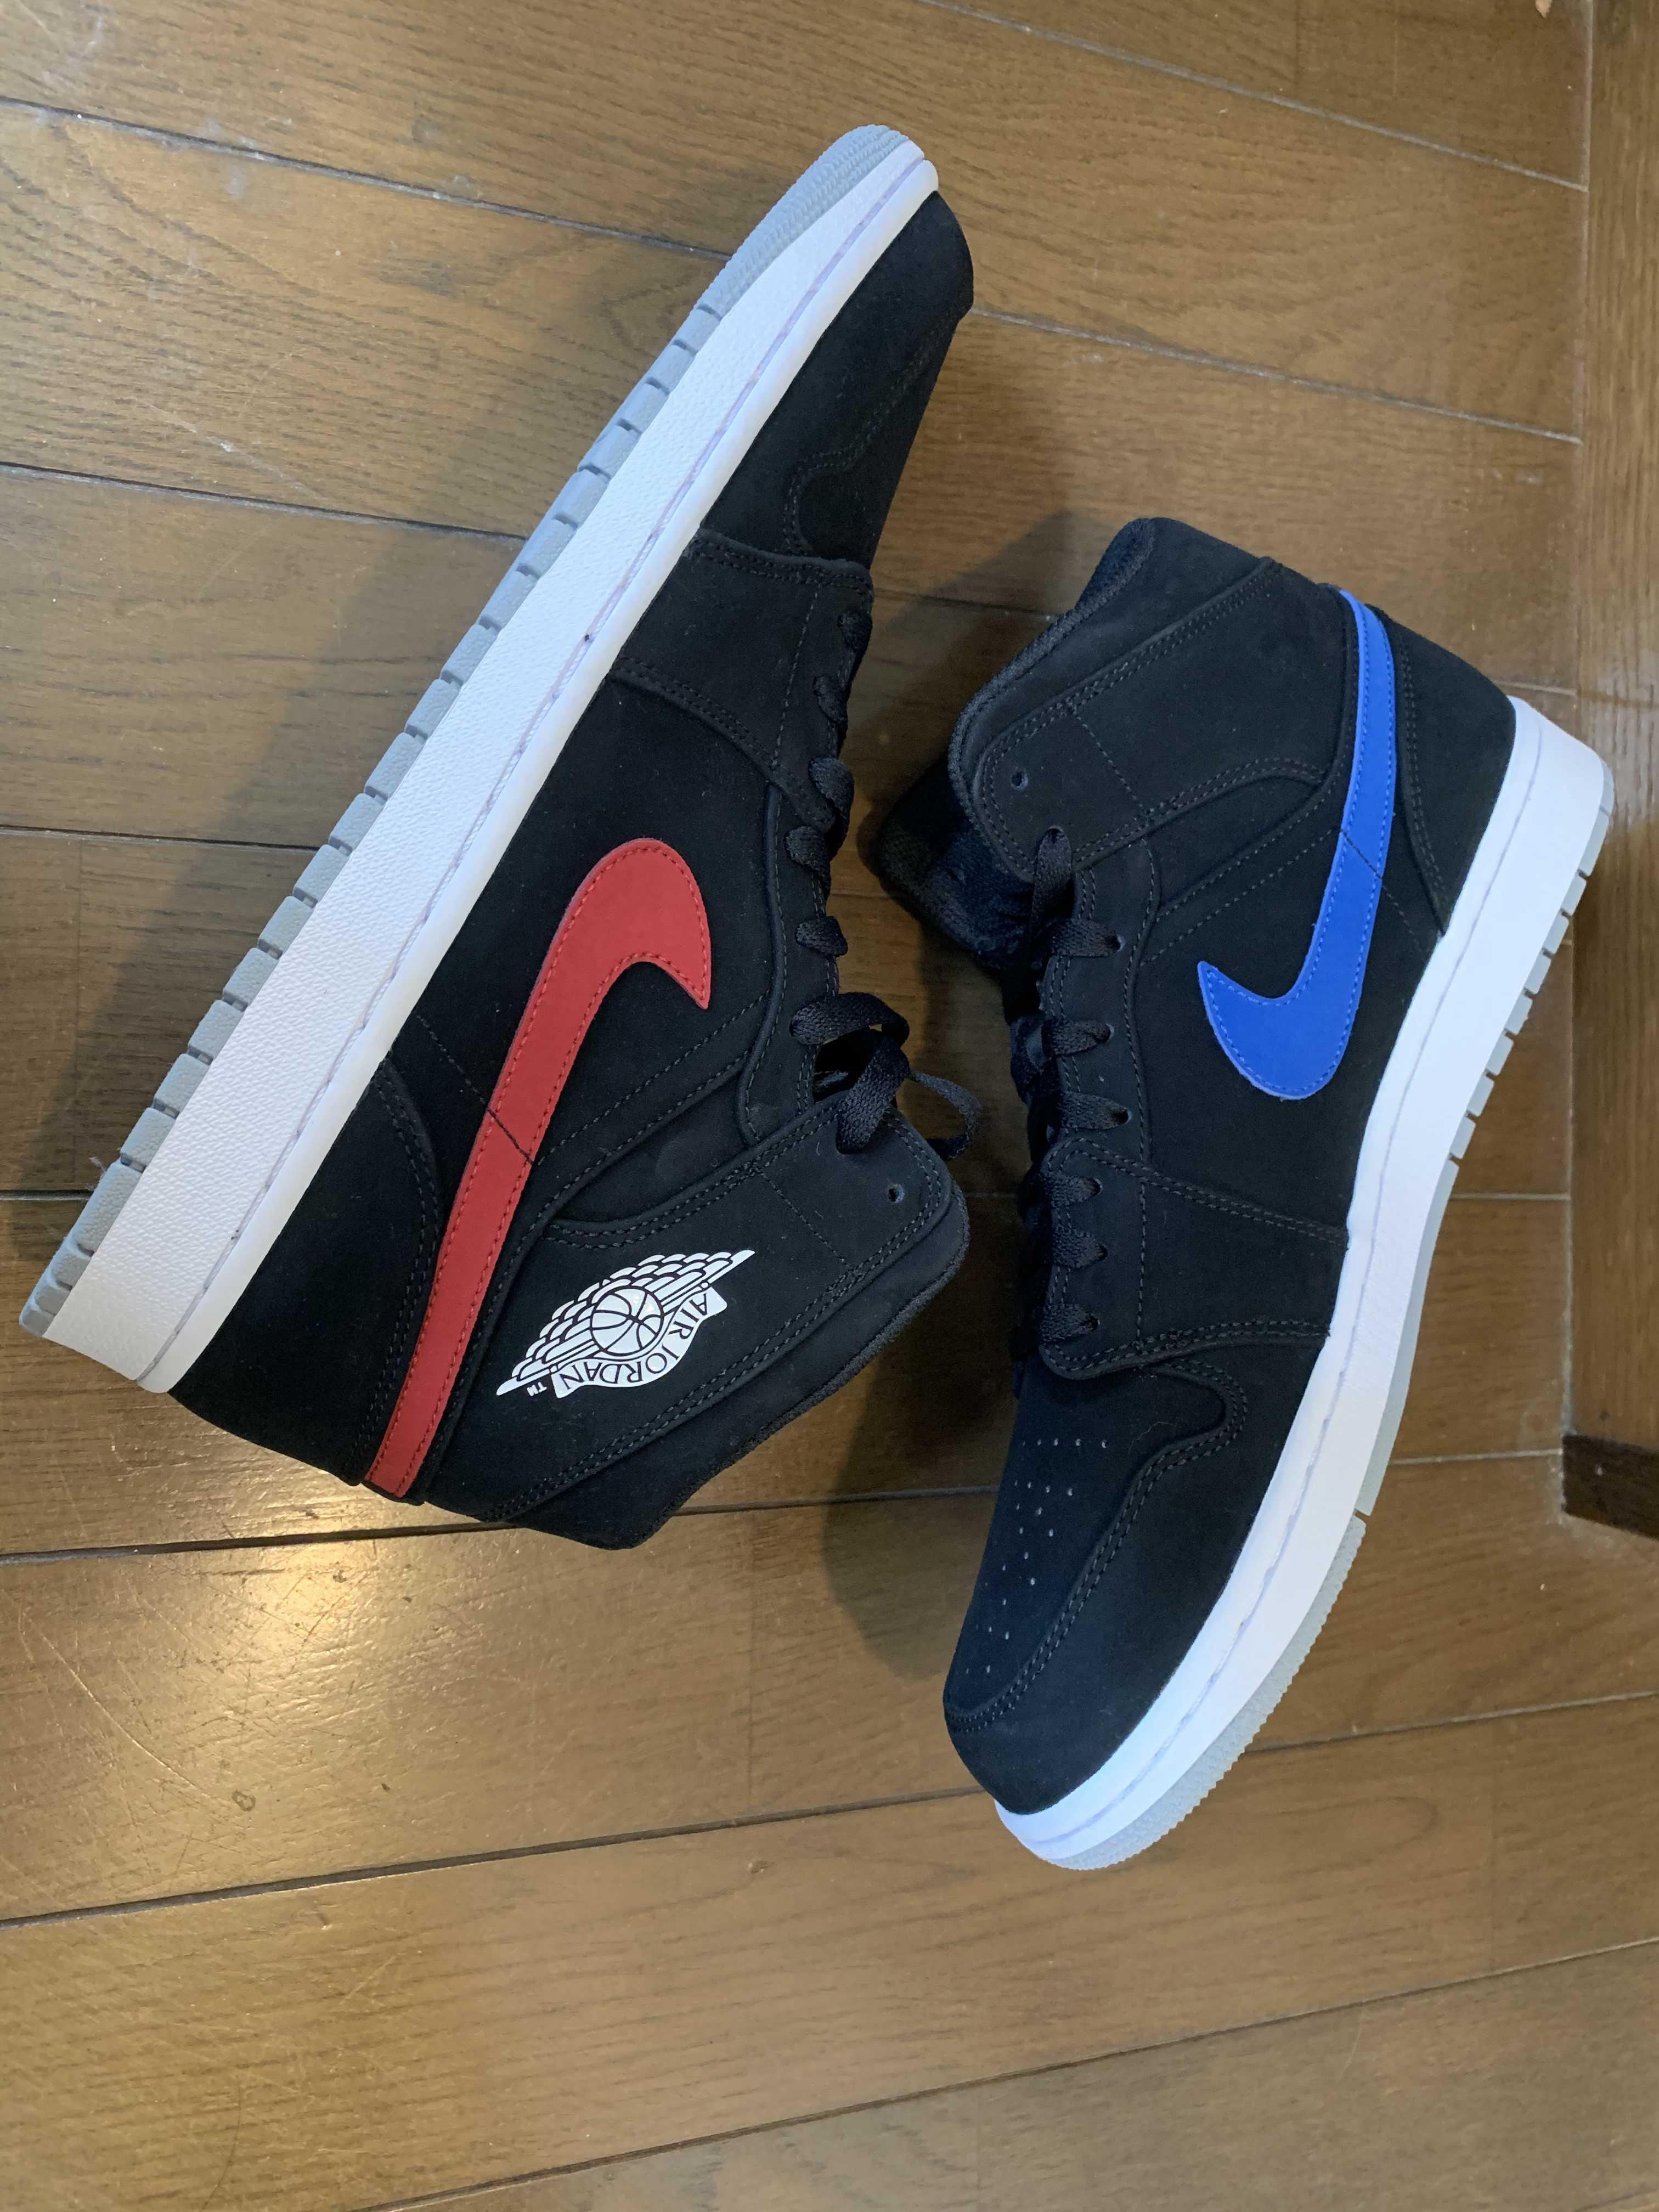 Jordan 1 Mid Multi-Color Swoosh Black